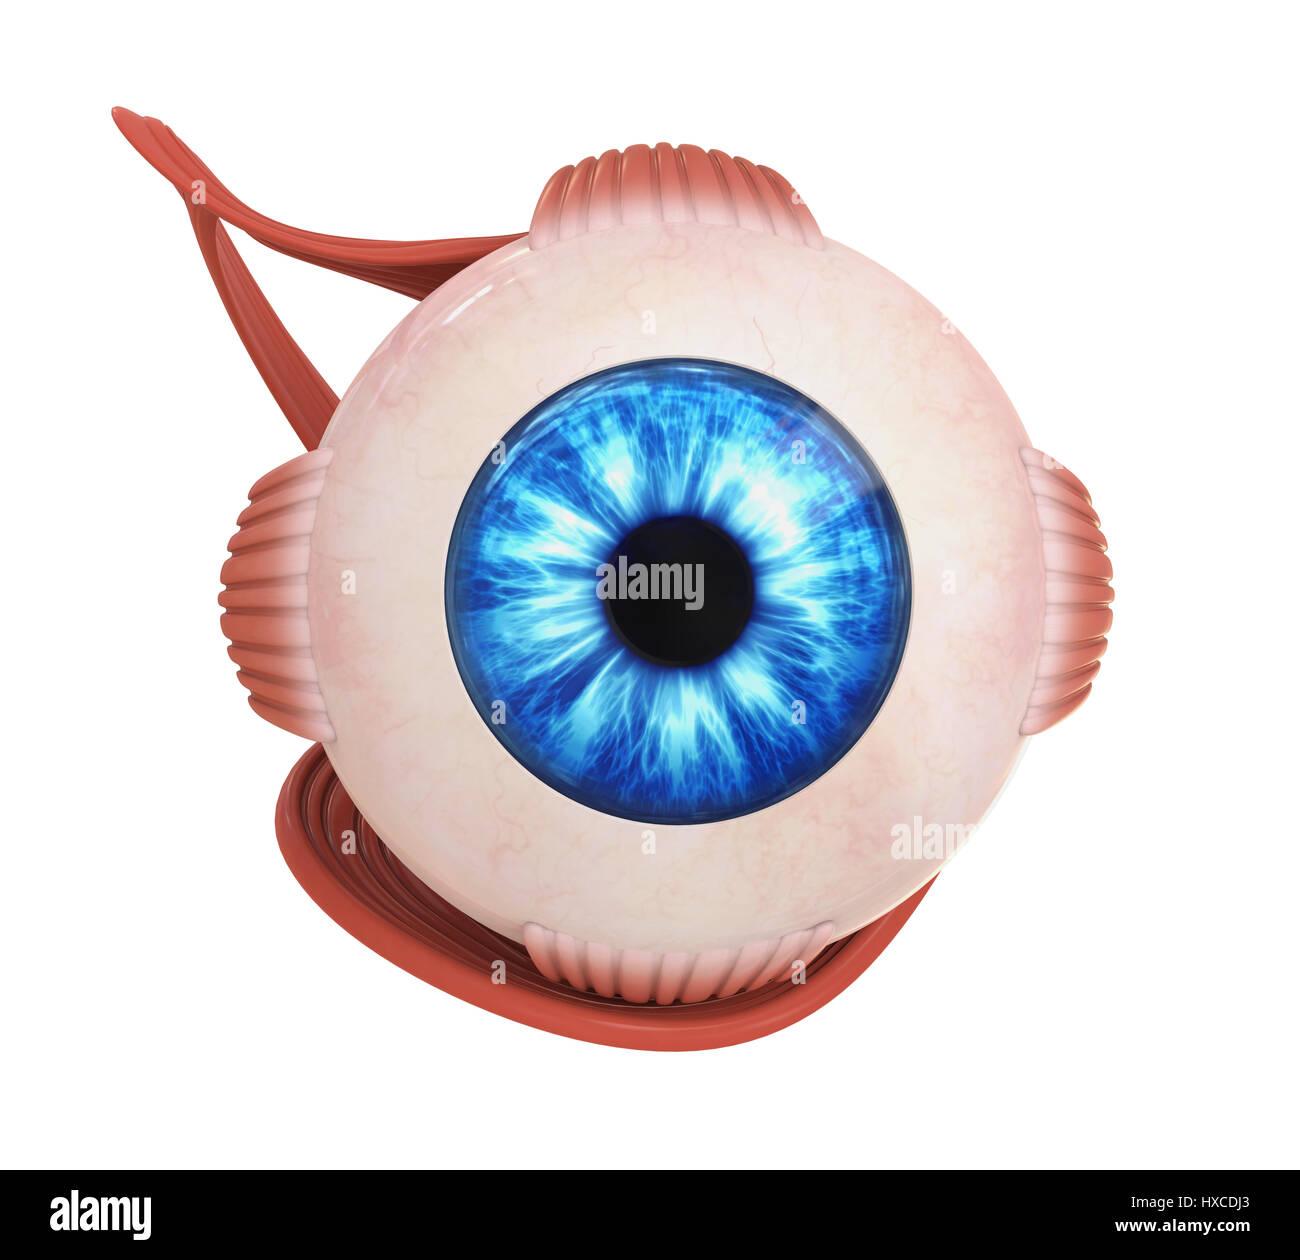 Eye lens diagram stock photos eye lens diagram stock images alamy human eye extraocular muscles stock image ccuart Image collections